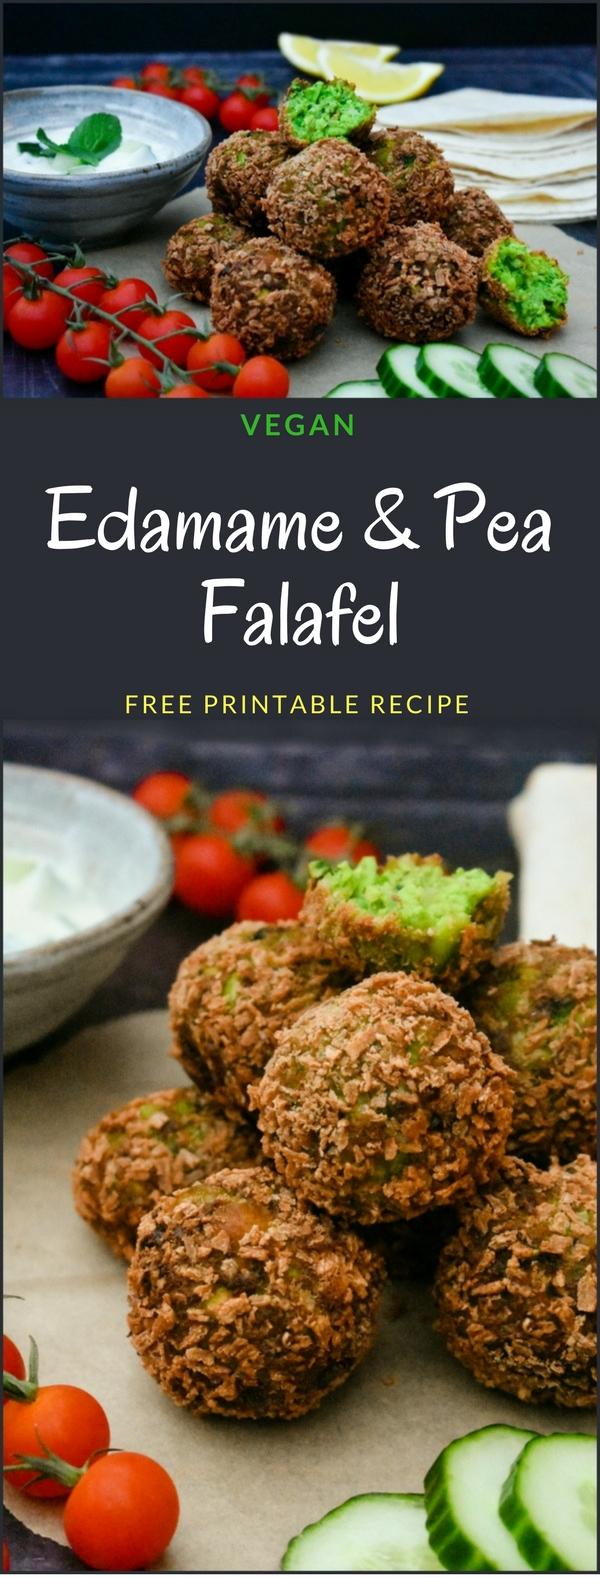 Green Edamame & Pea Falafel with a Yoghurt, Cucumber & Mint Dip (vegan recipe)